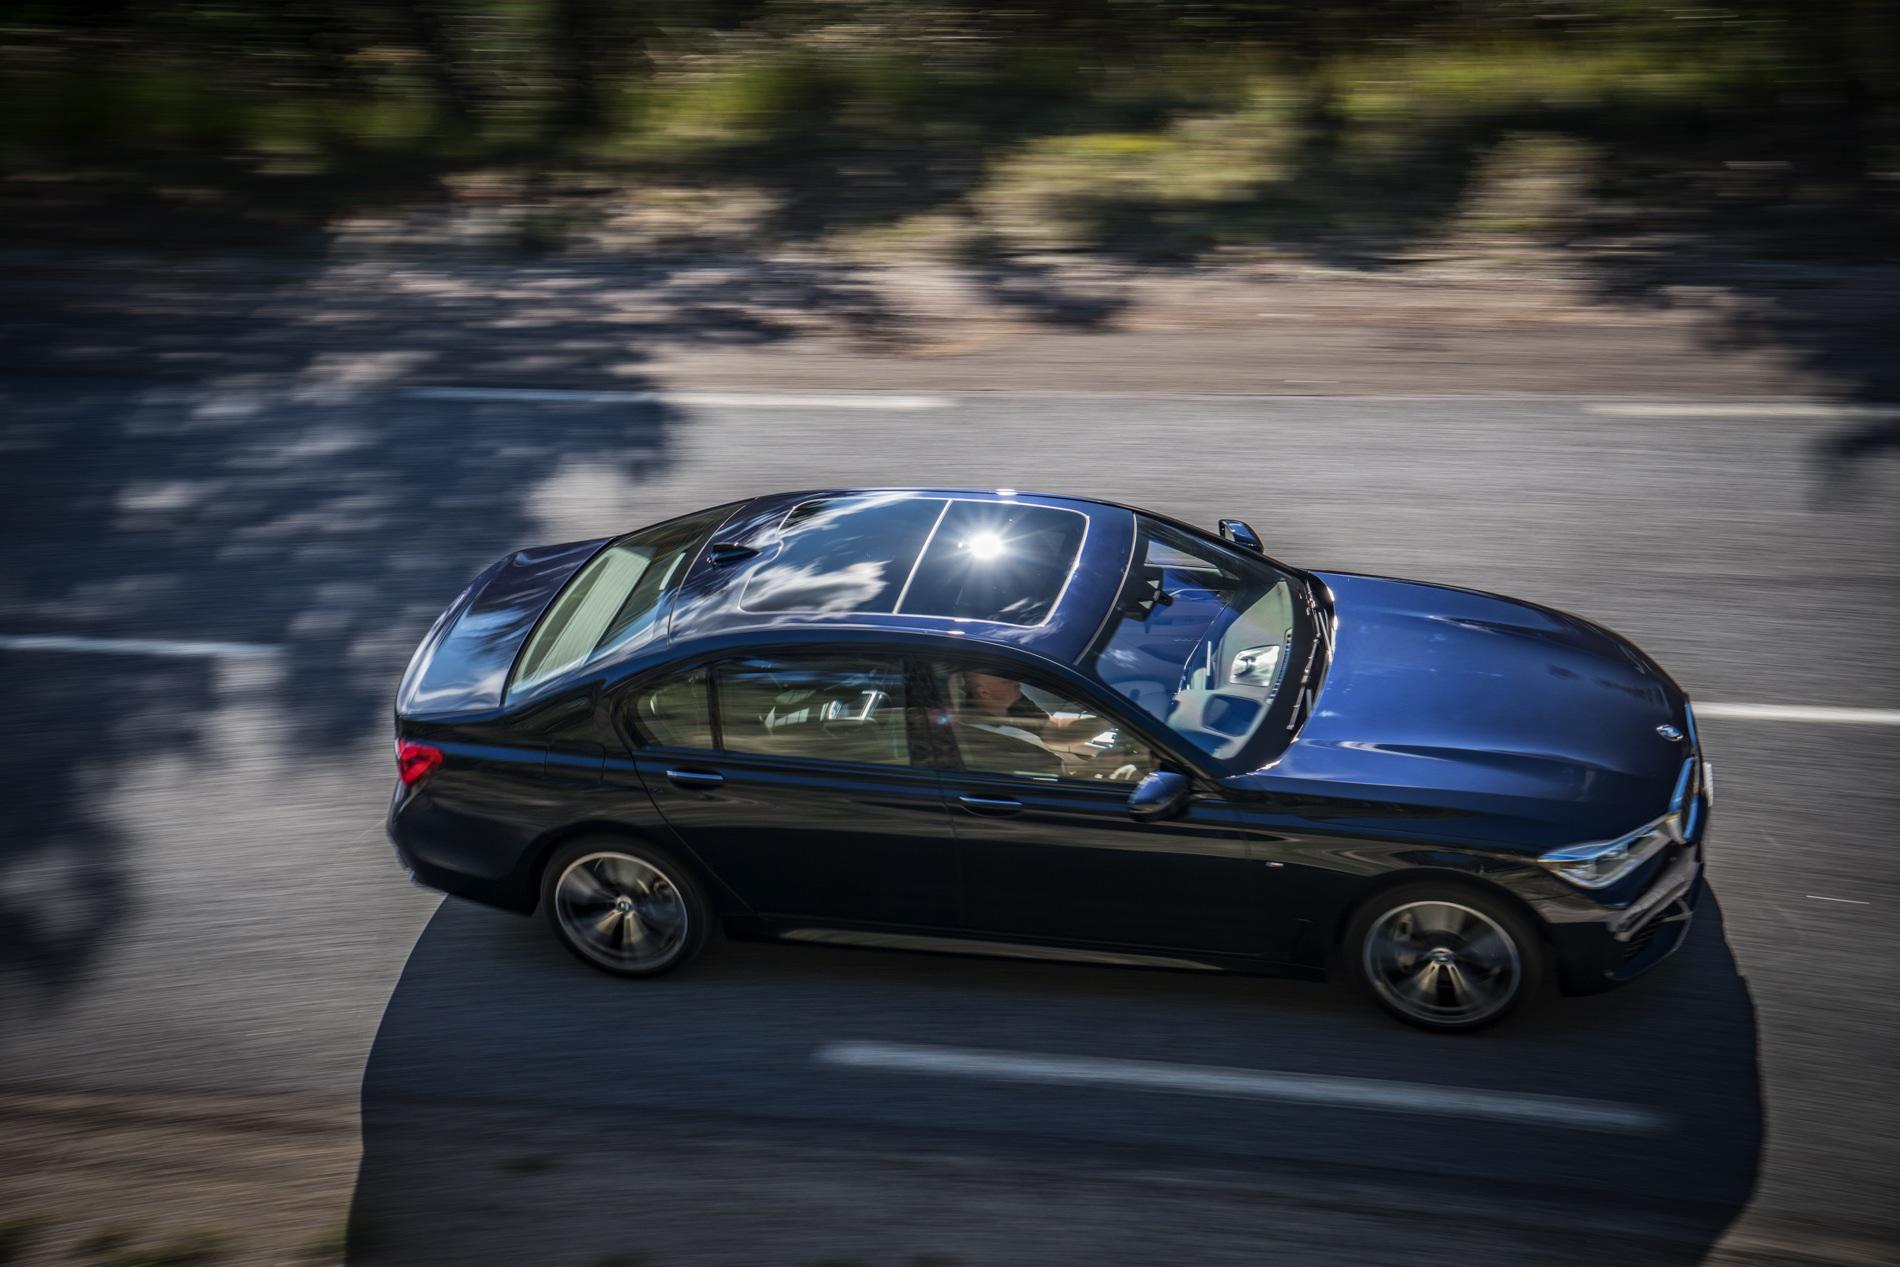 2015 BMW 730Ld Carbon Black 16 7 Series2016